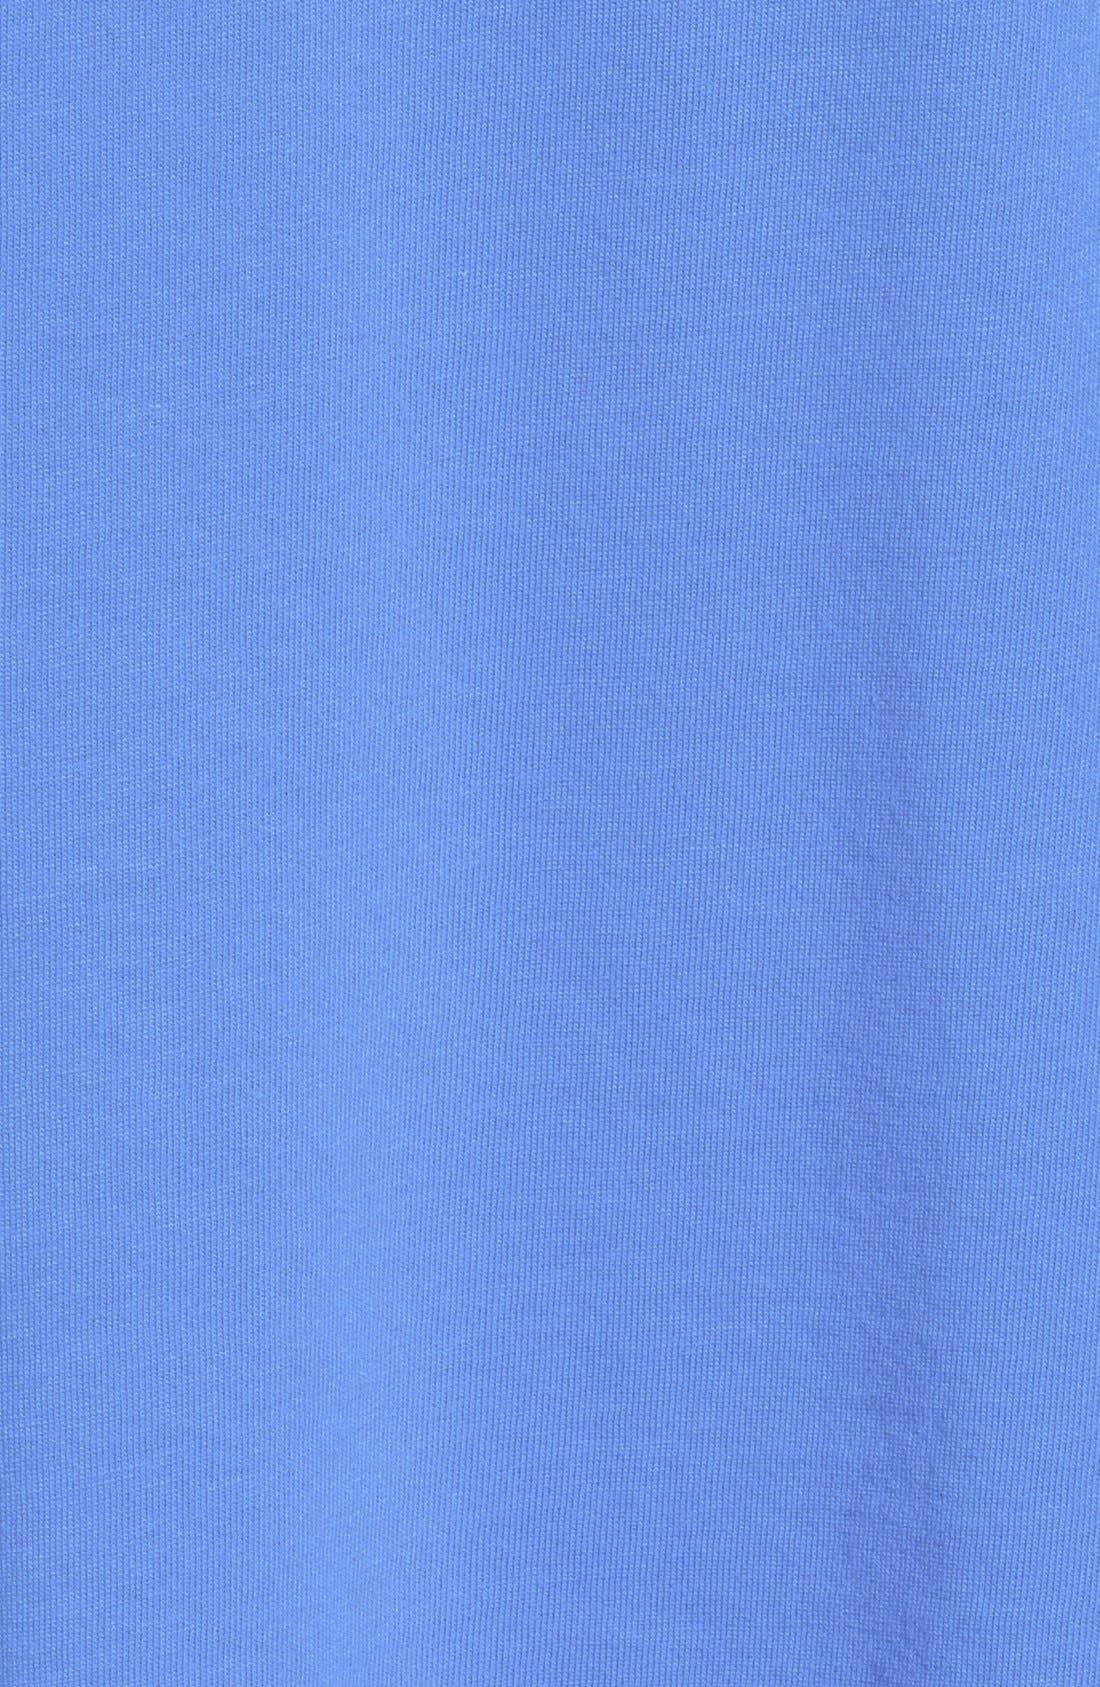 Alternate Image 5  - Vineyard Vines Snowman Whale Cotton Tee